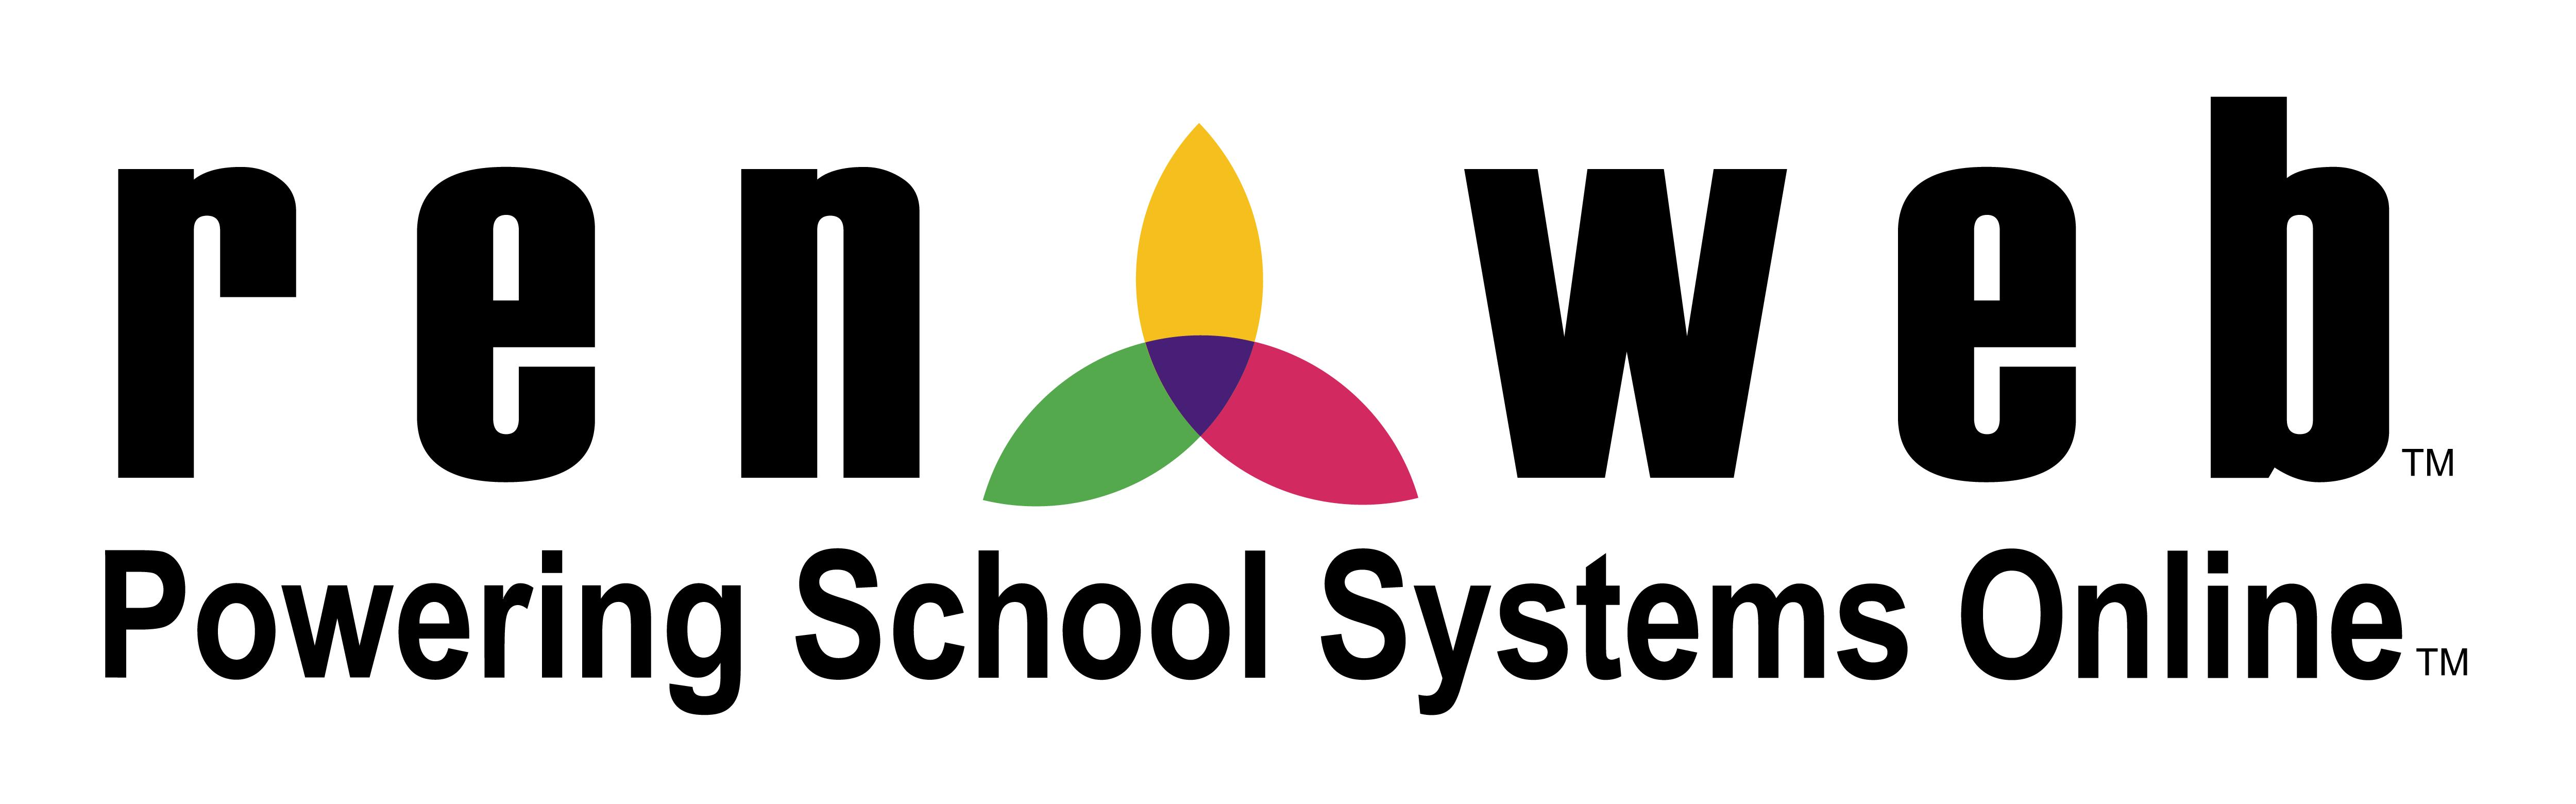 RenWeb logo